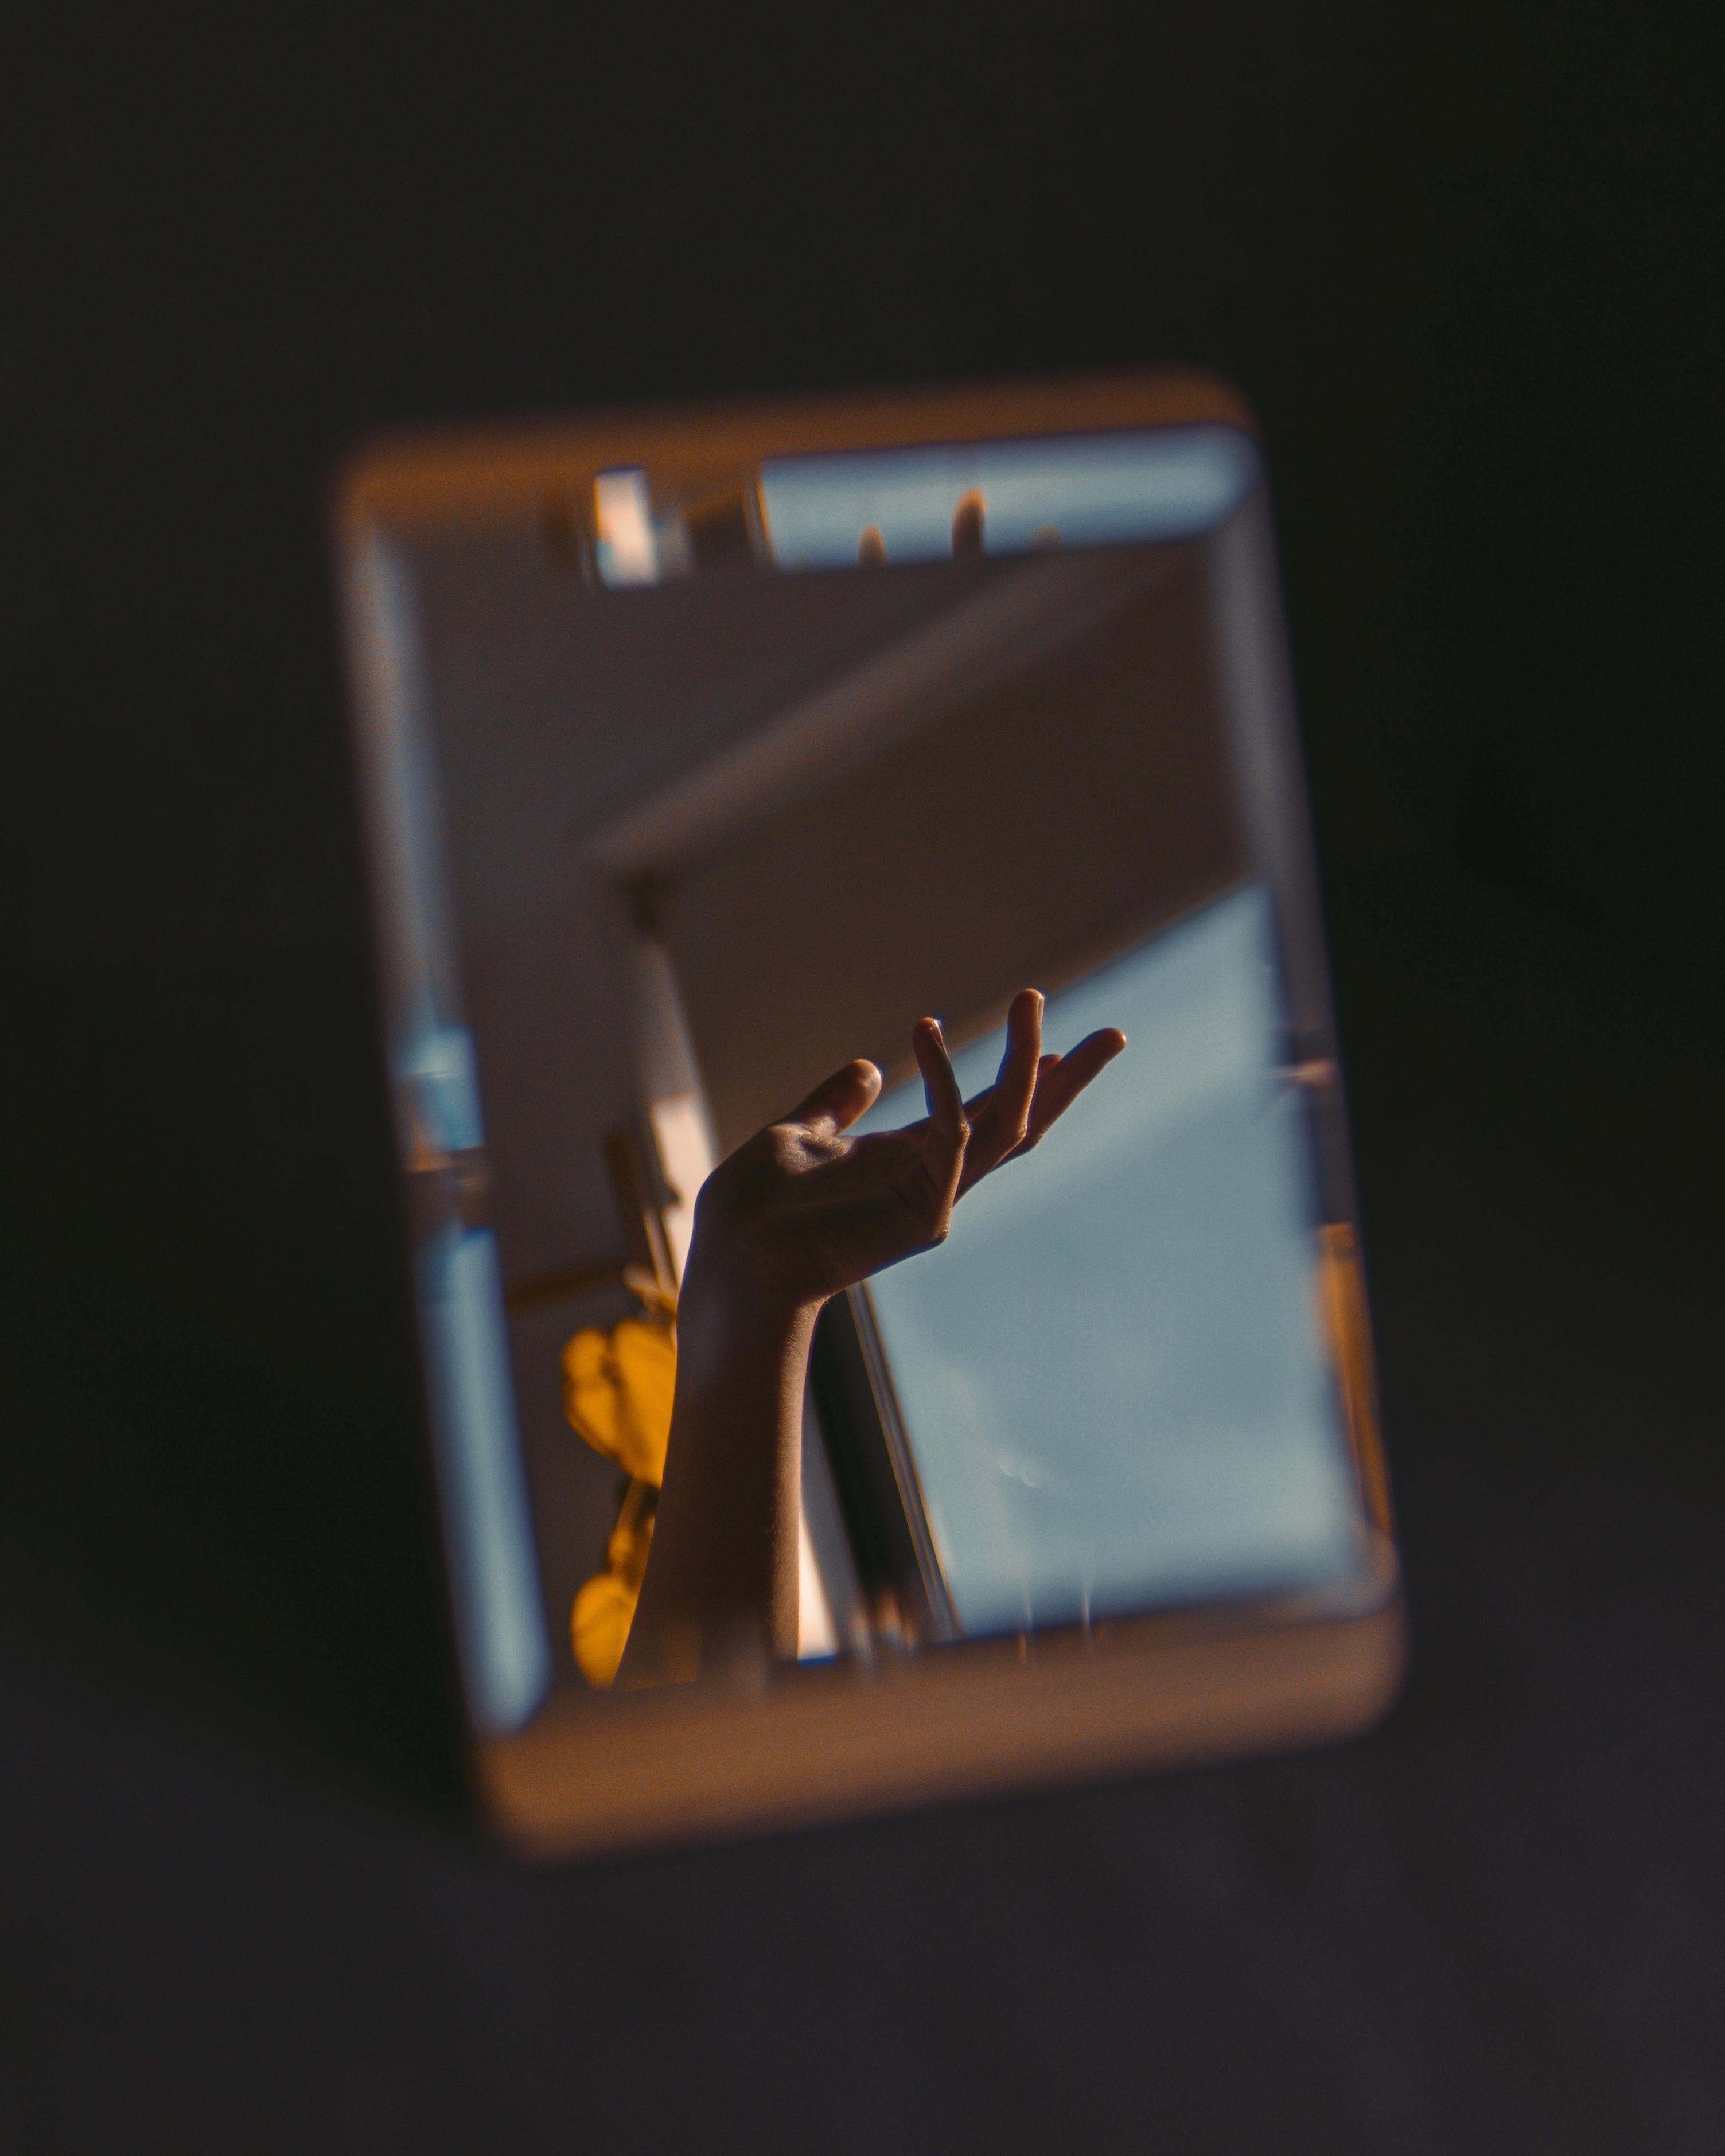 pexels-janiere-fernandez-4728126